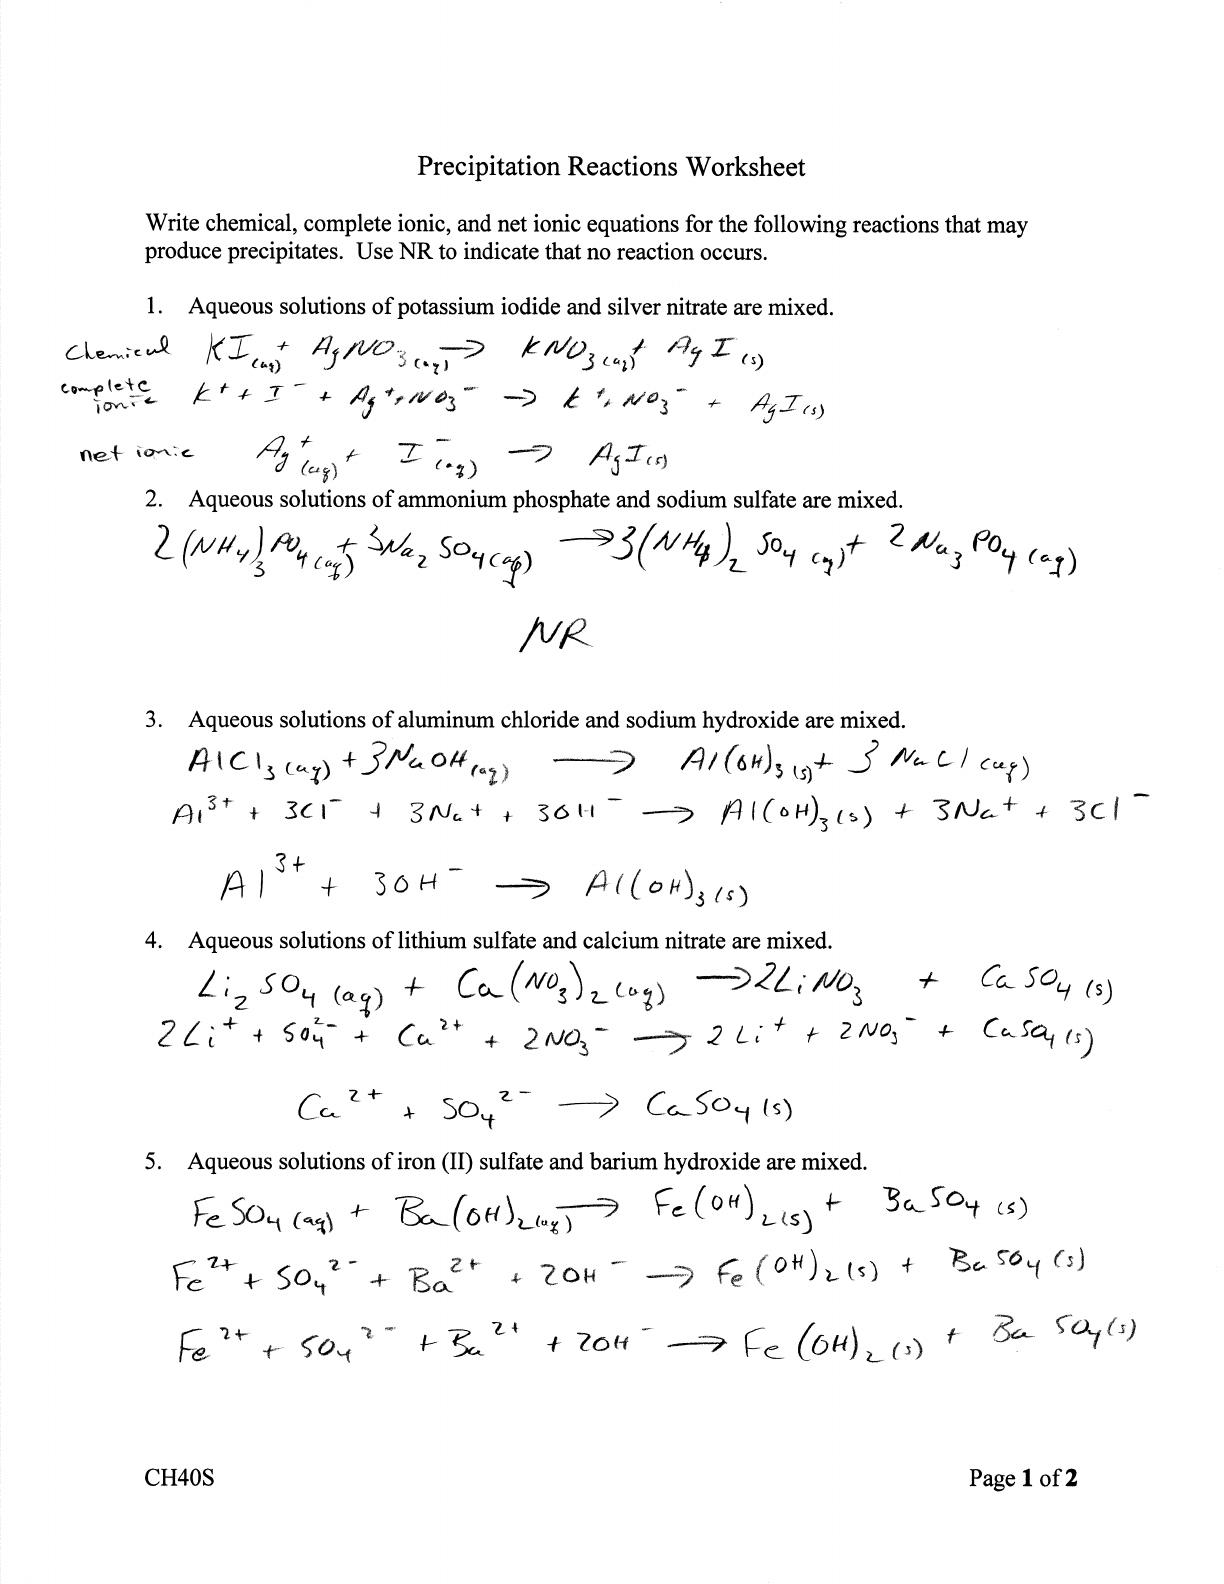 Precipitation Reactions Worksheet Pc Reactions Worksheet